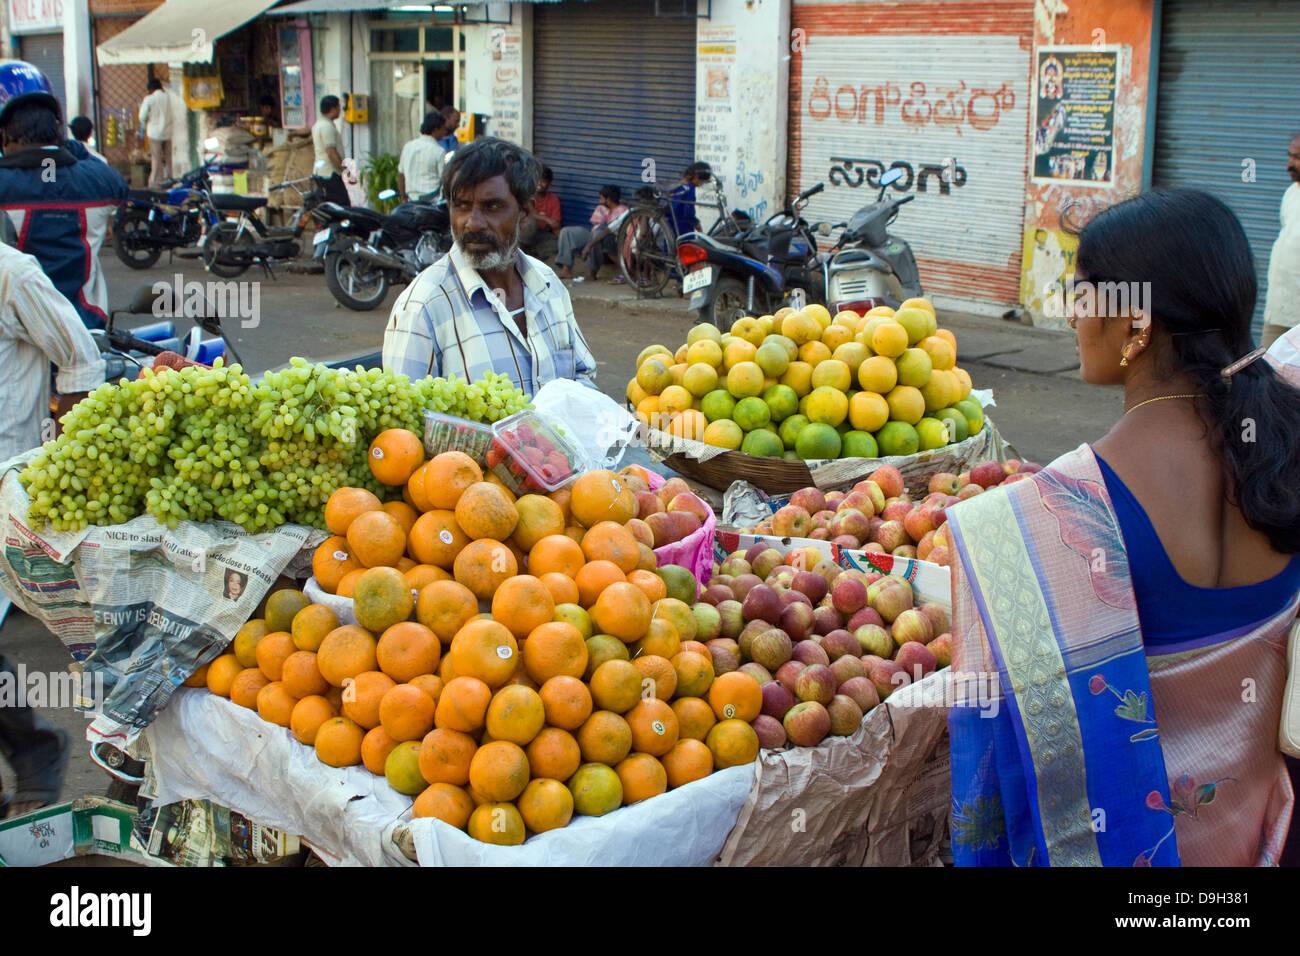 Asia, India, Karnataka, Mysore, fruiterer in his market stall Stock Photo